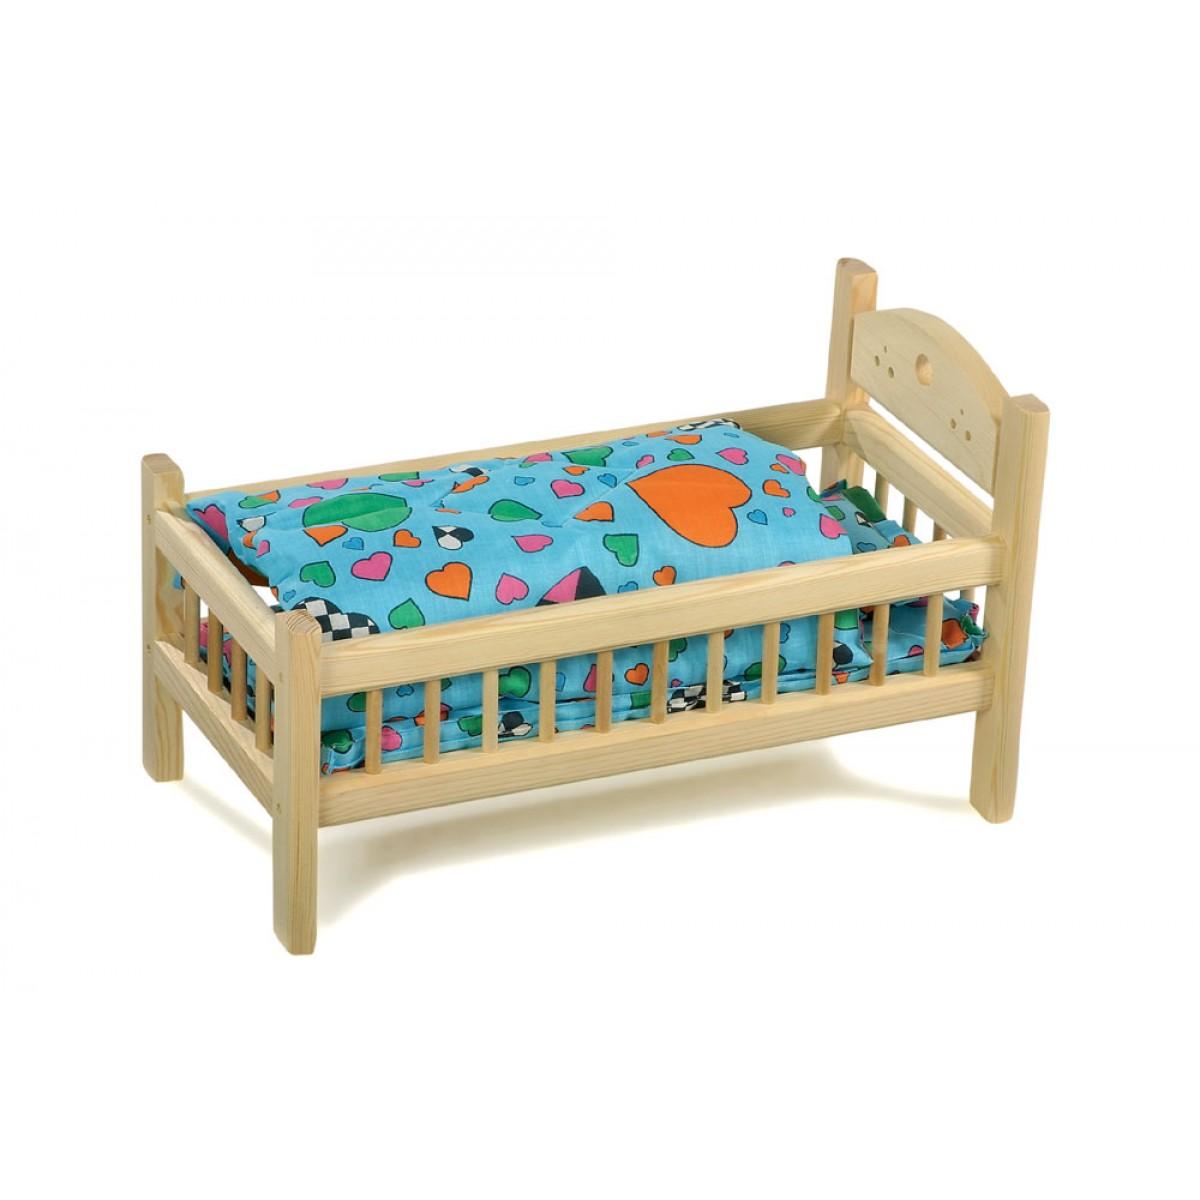 puppenbett aus holz kindertr ume vom holzspielzeug profi. Black Bedroom Furniture Sets. Home Design Ideas